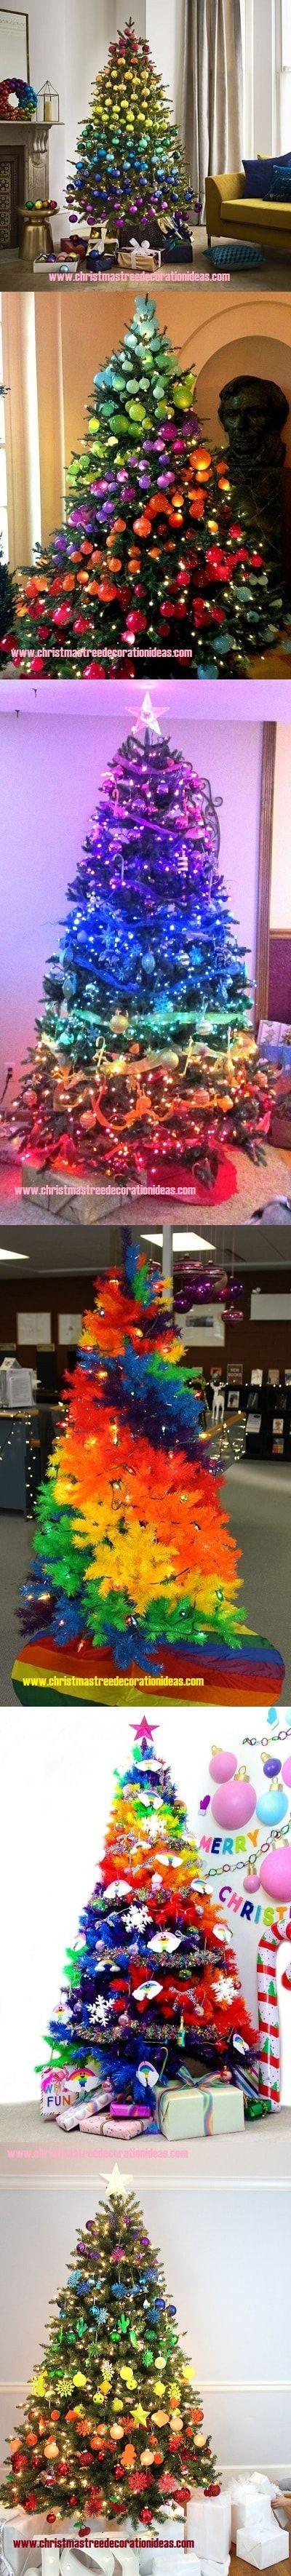 Rainbow Christmas Tree Decorating Ideas